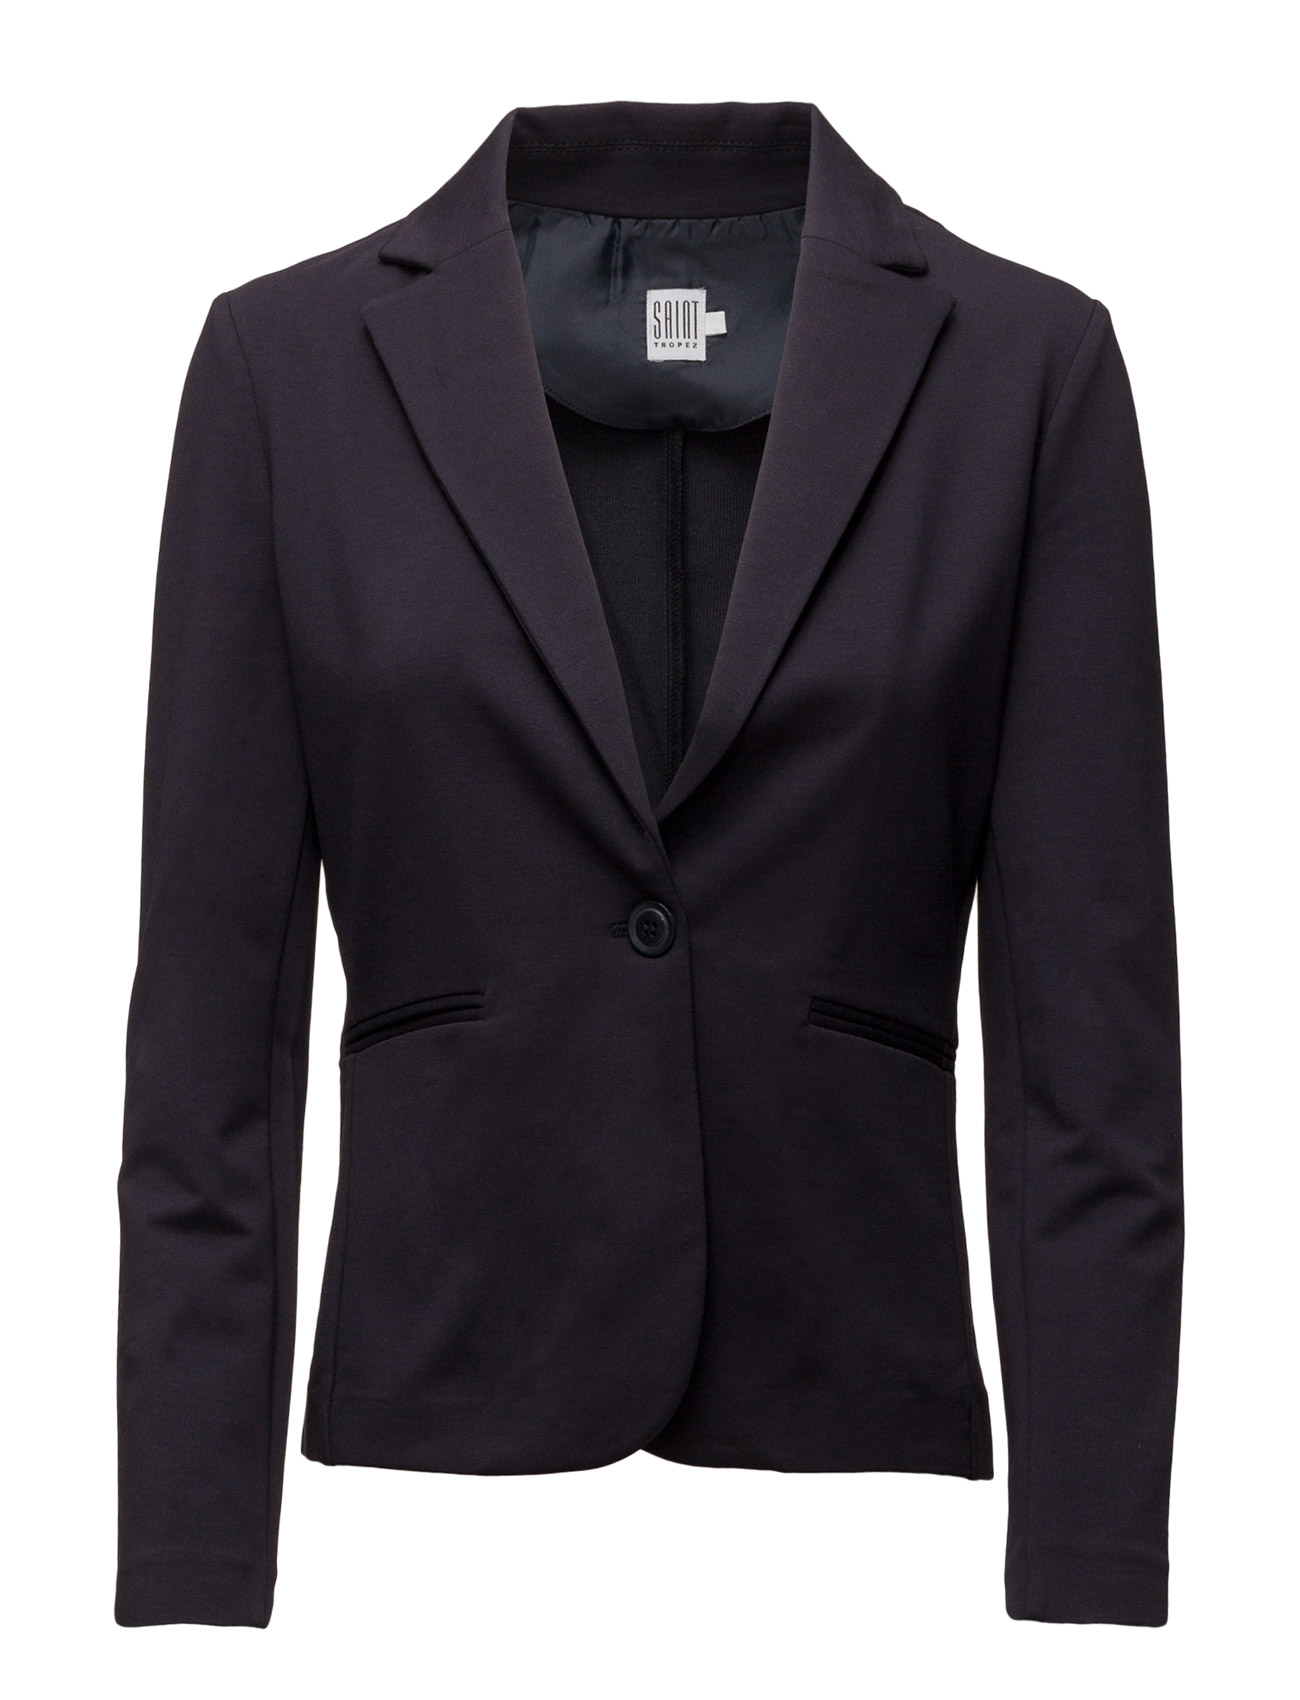 Jersey Blazer (Bl Deep) (499 kr) - Saint Tropez -  94e058861b000